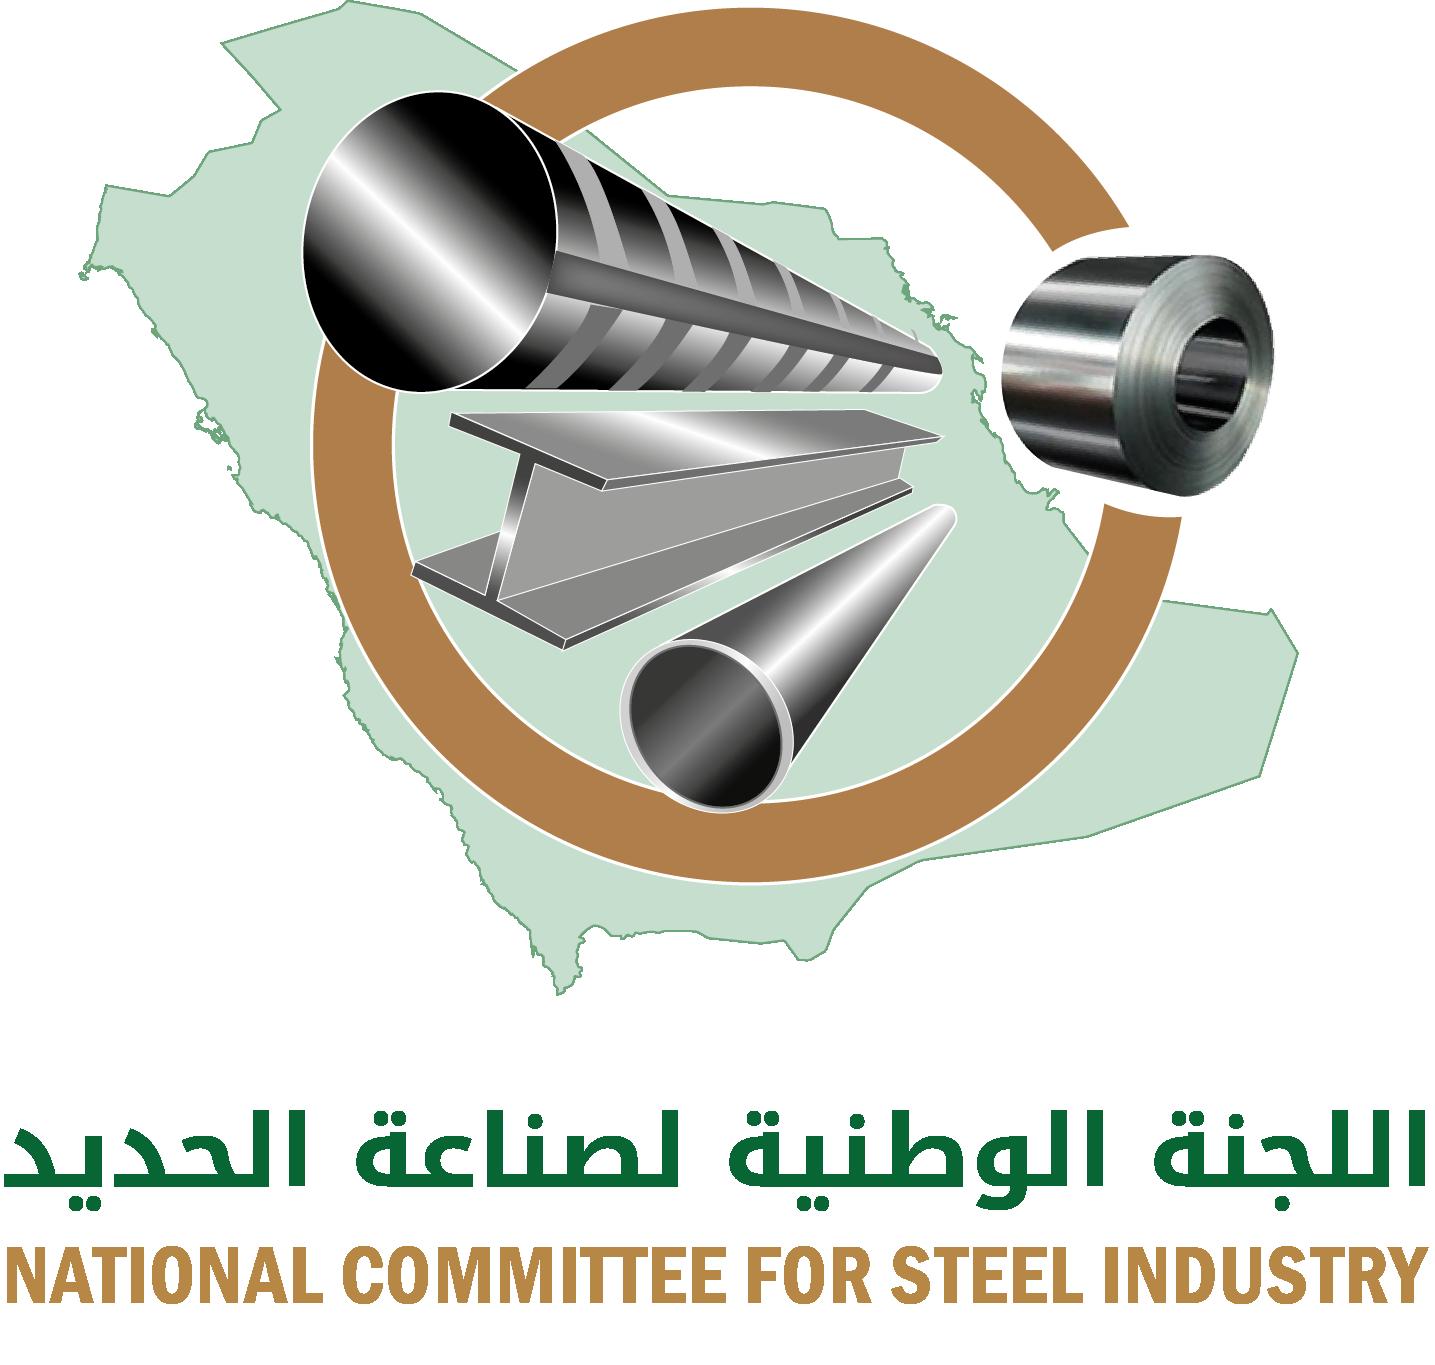 Kingdom of Saudi Arabia - National Committee for Steel Industry